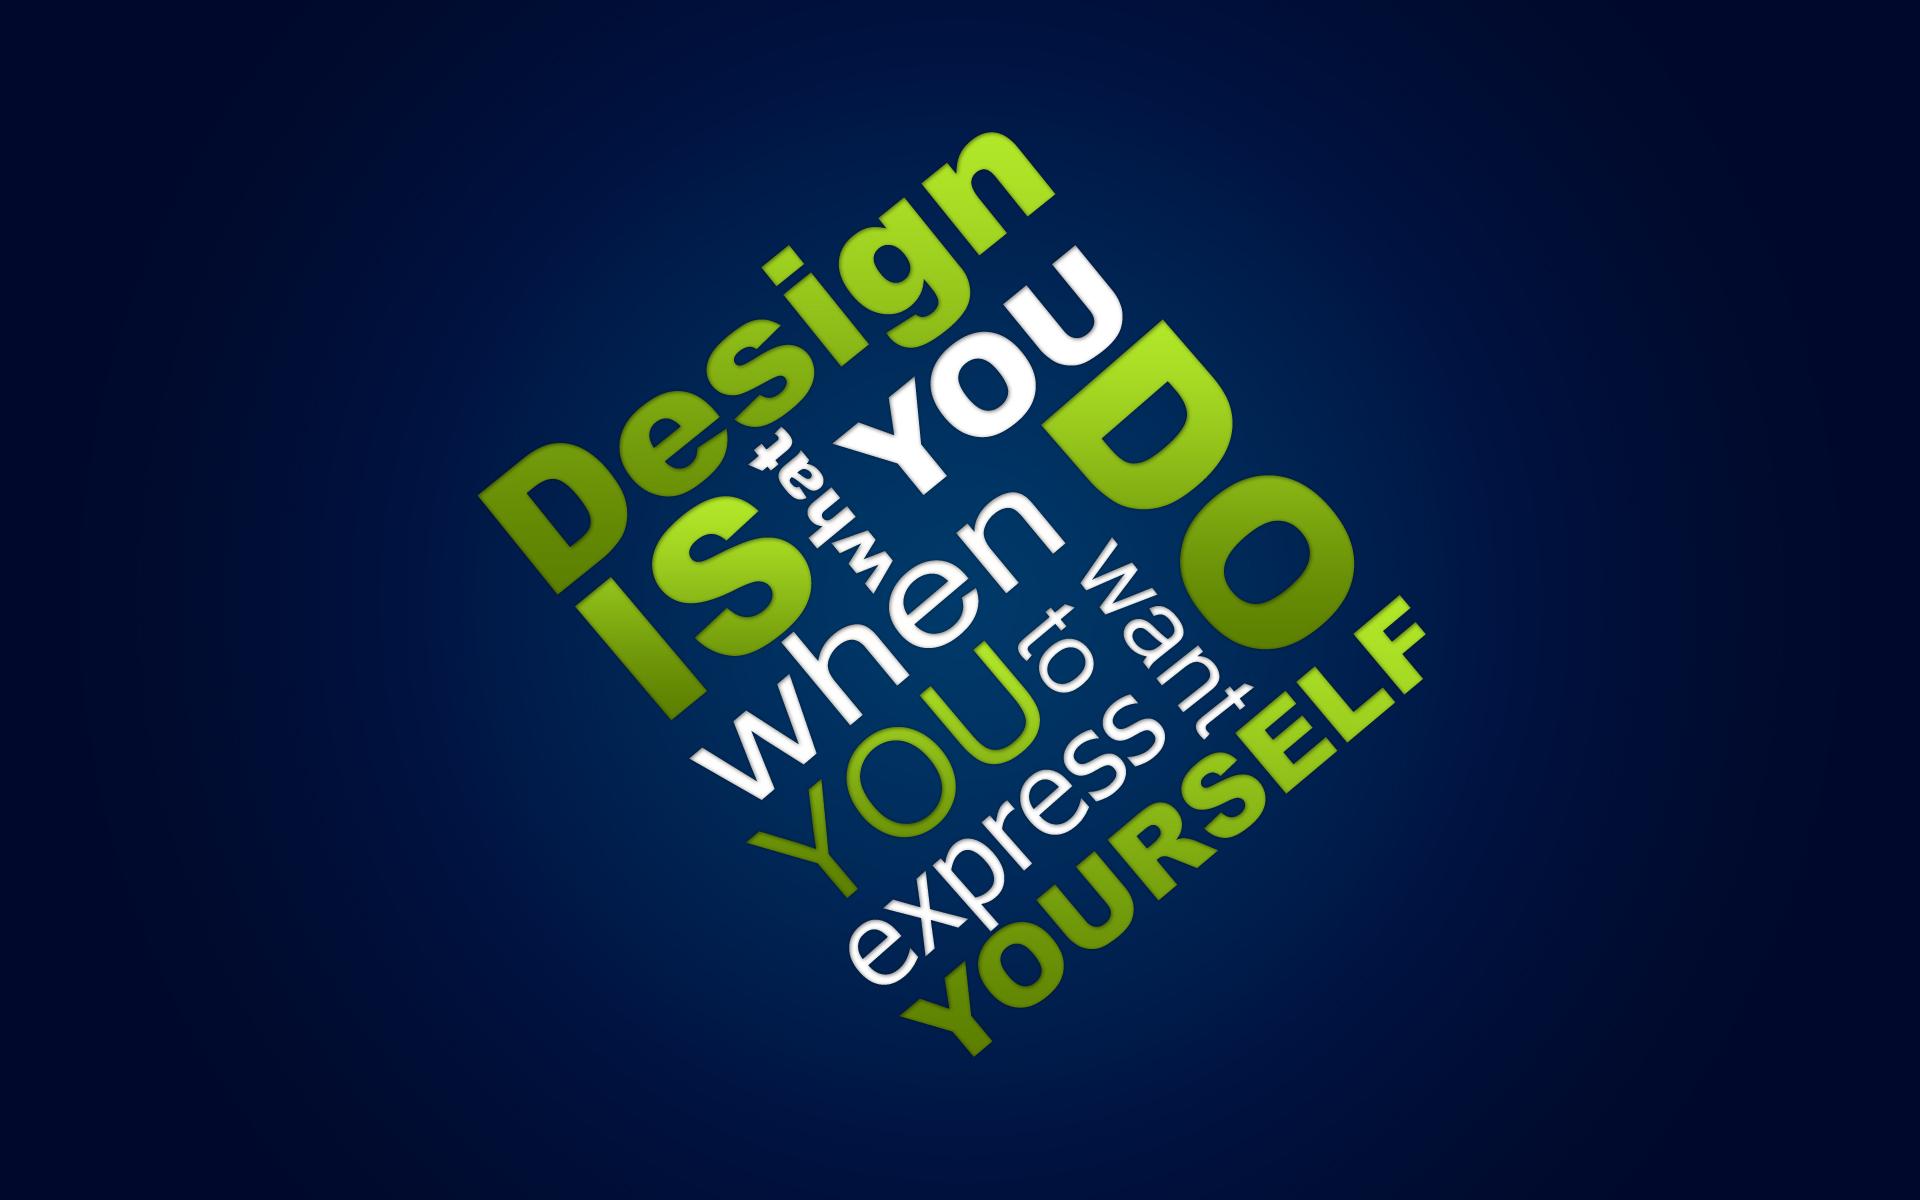 graphic designer backgrounds